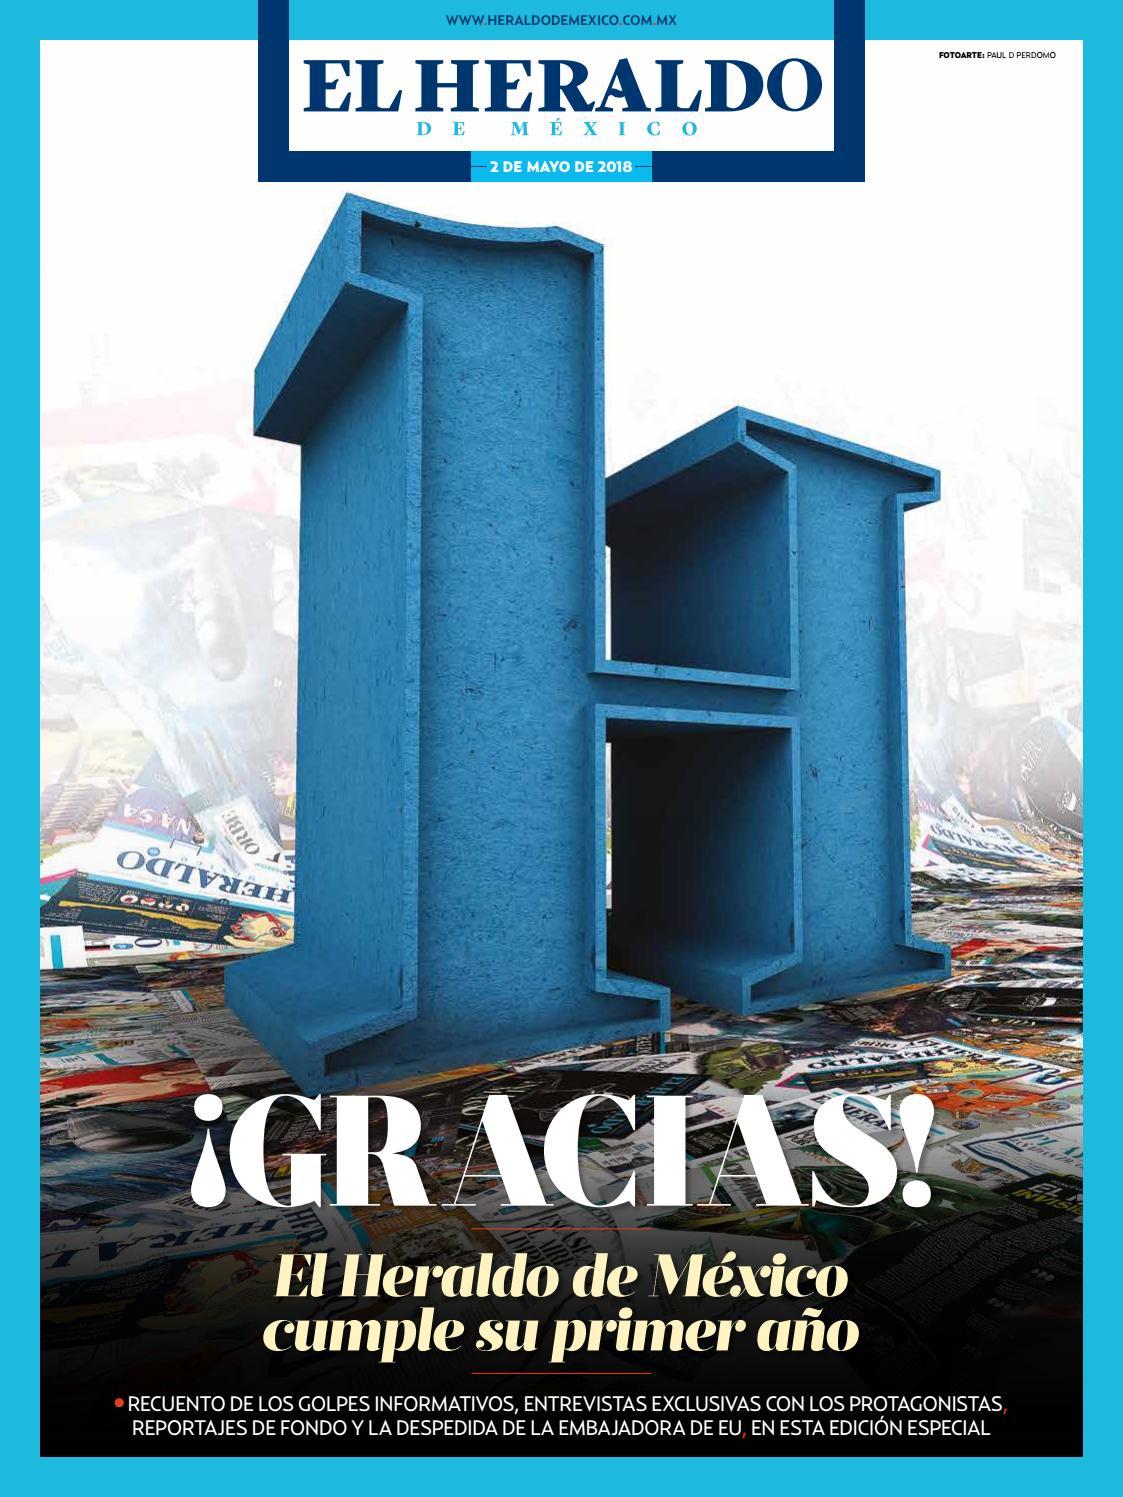 76cf6a16e4db Heraldo aniversario by El Heraldo de México - issuu